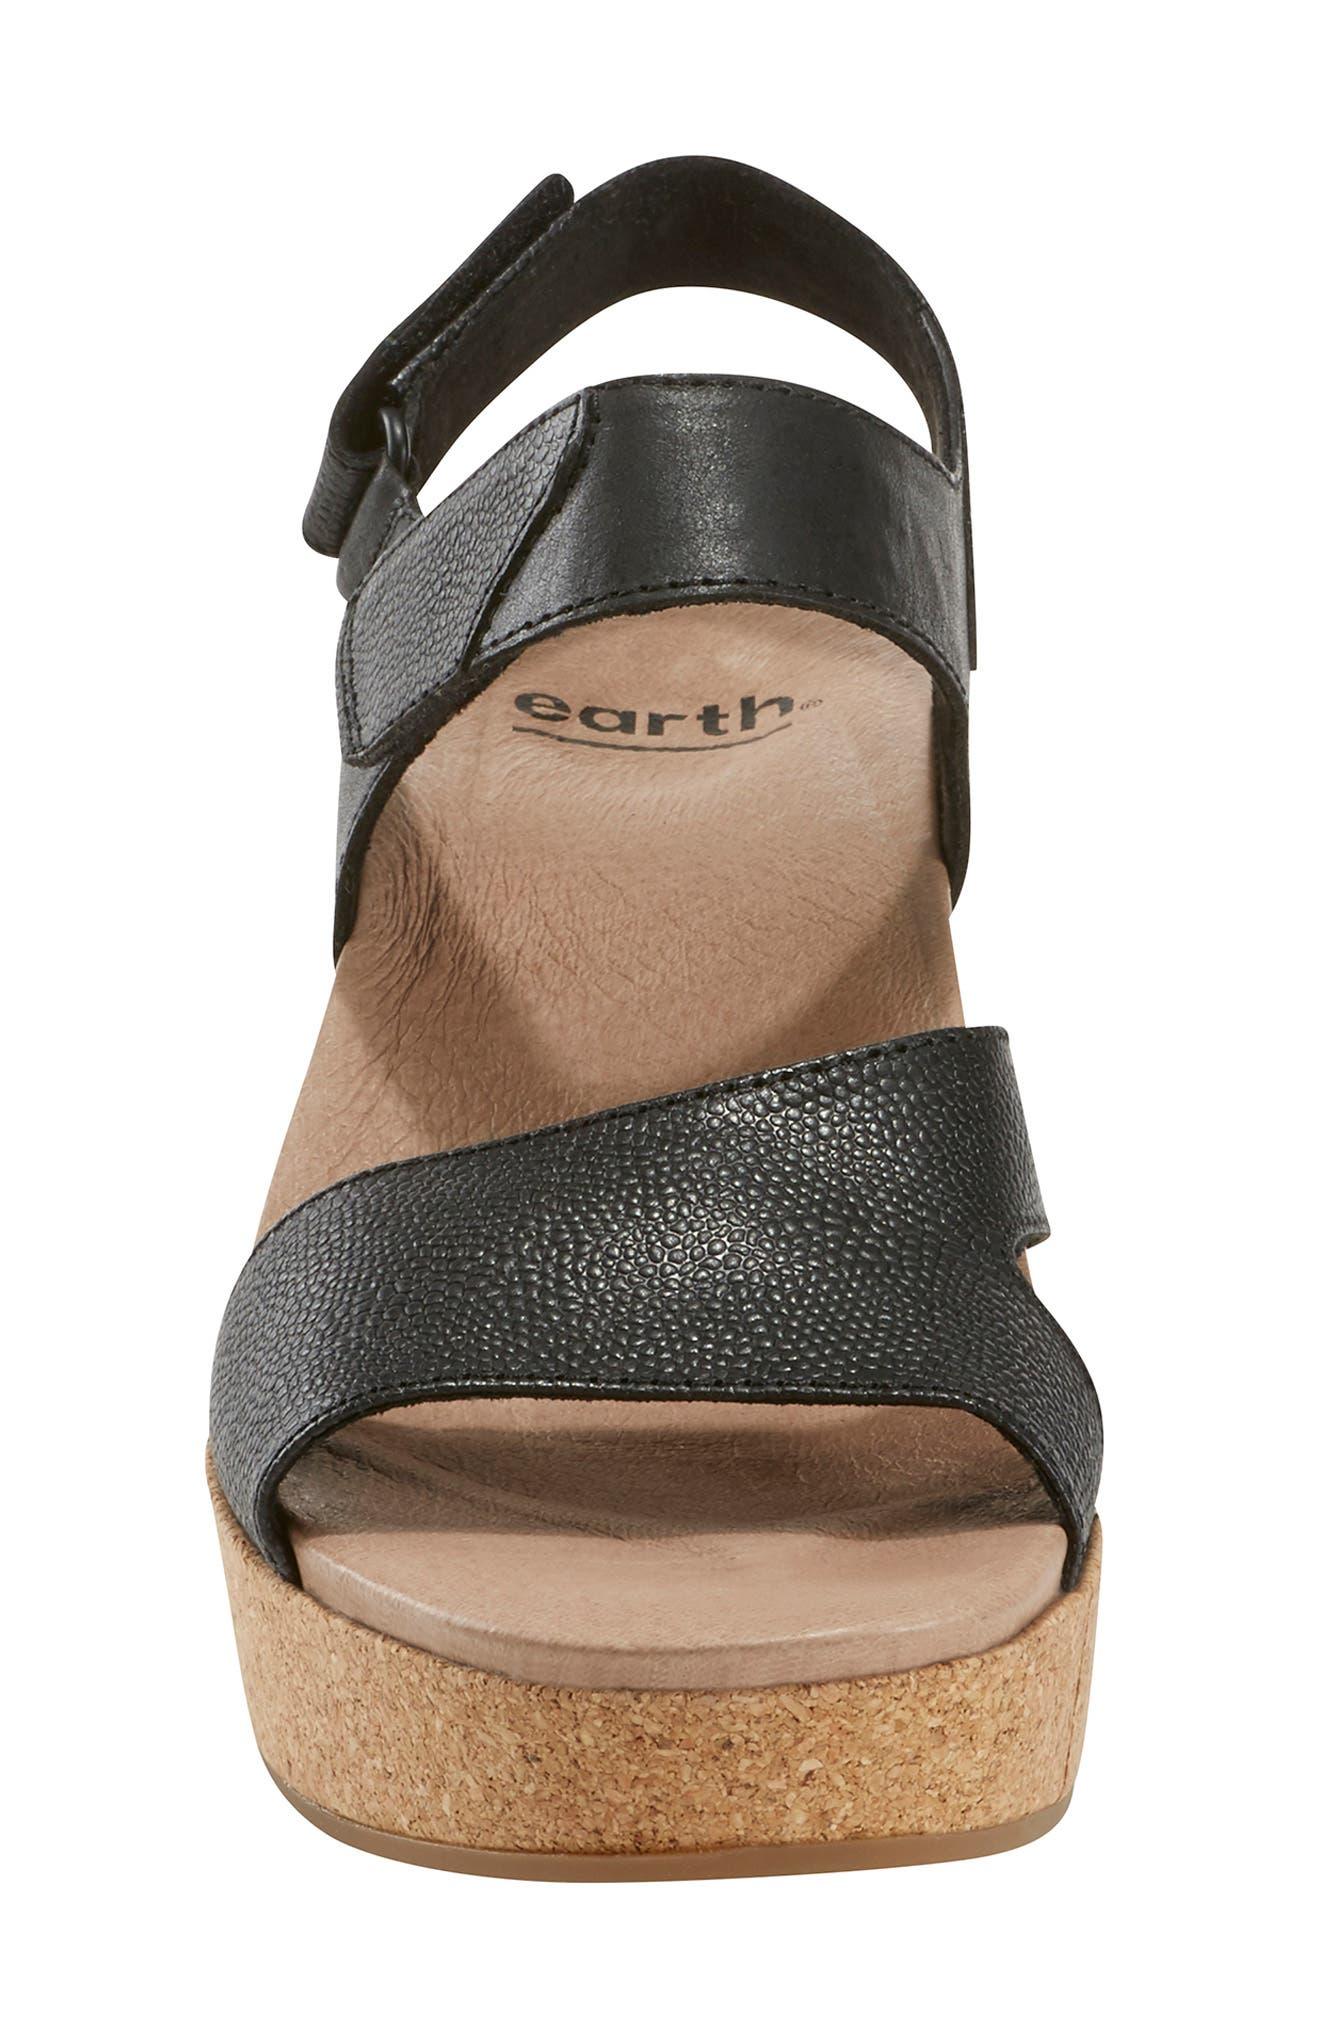 EARTH<SUP>®</SUP>, Kella Platform Sandal, Alternate thumbnail 4, color, BLACK LEATHER